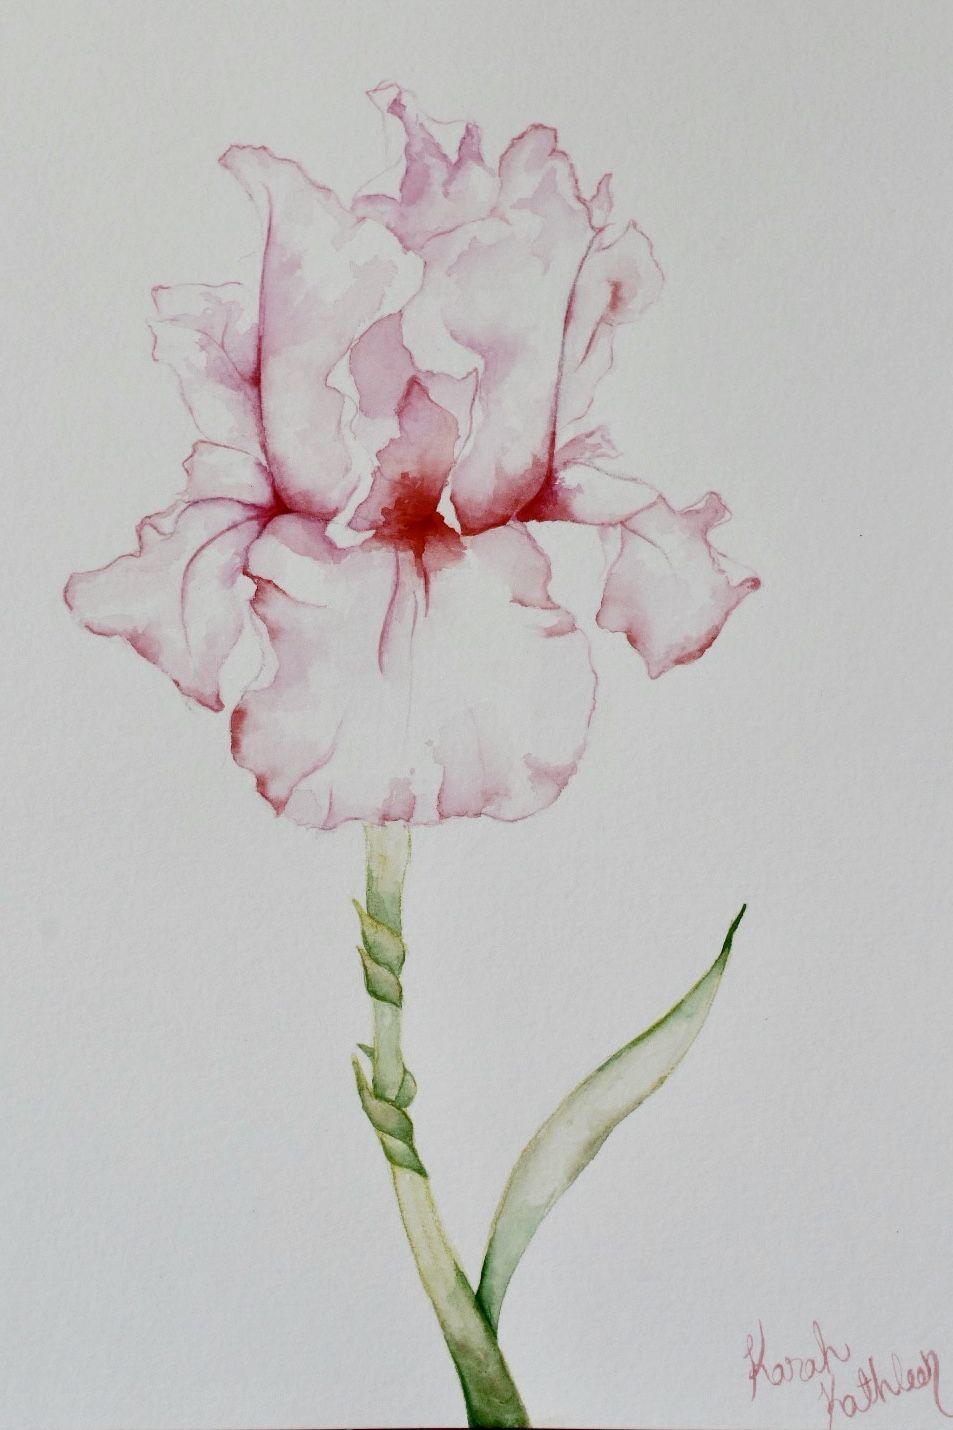 Watercolor pink iris flower by karah kathleen watercolor watercolor pink iris flower by karah kathleen izmirmasajfo